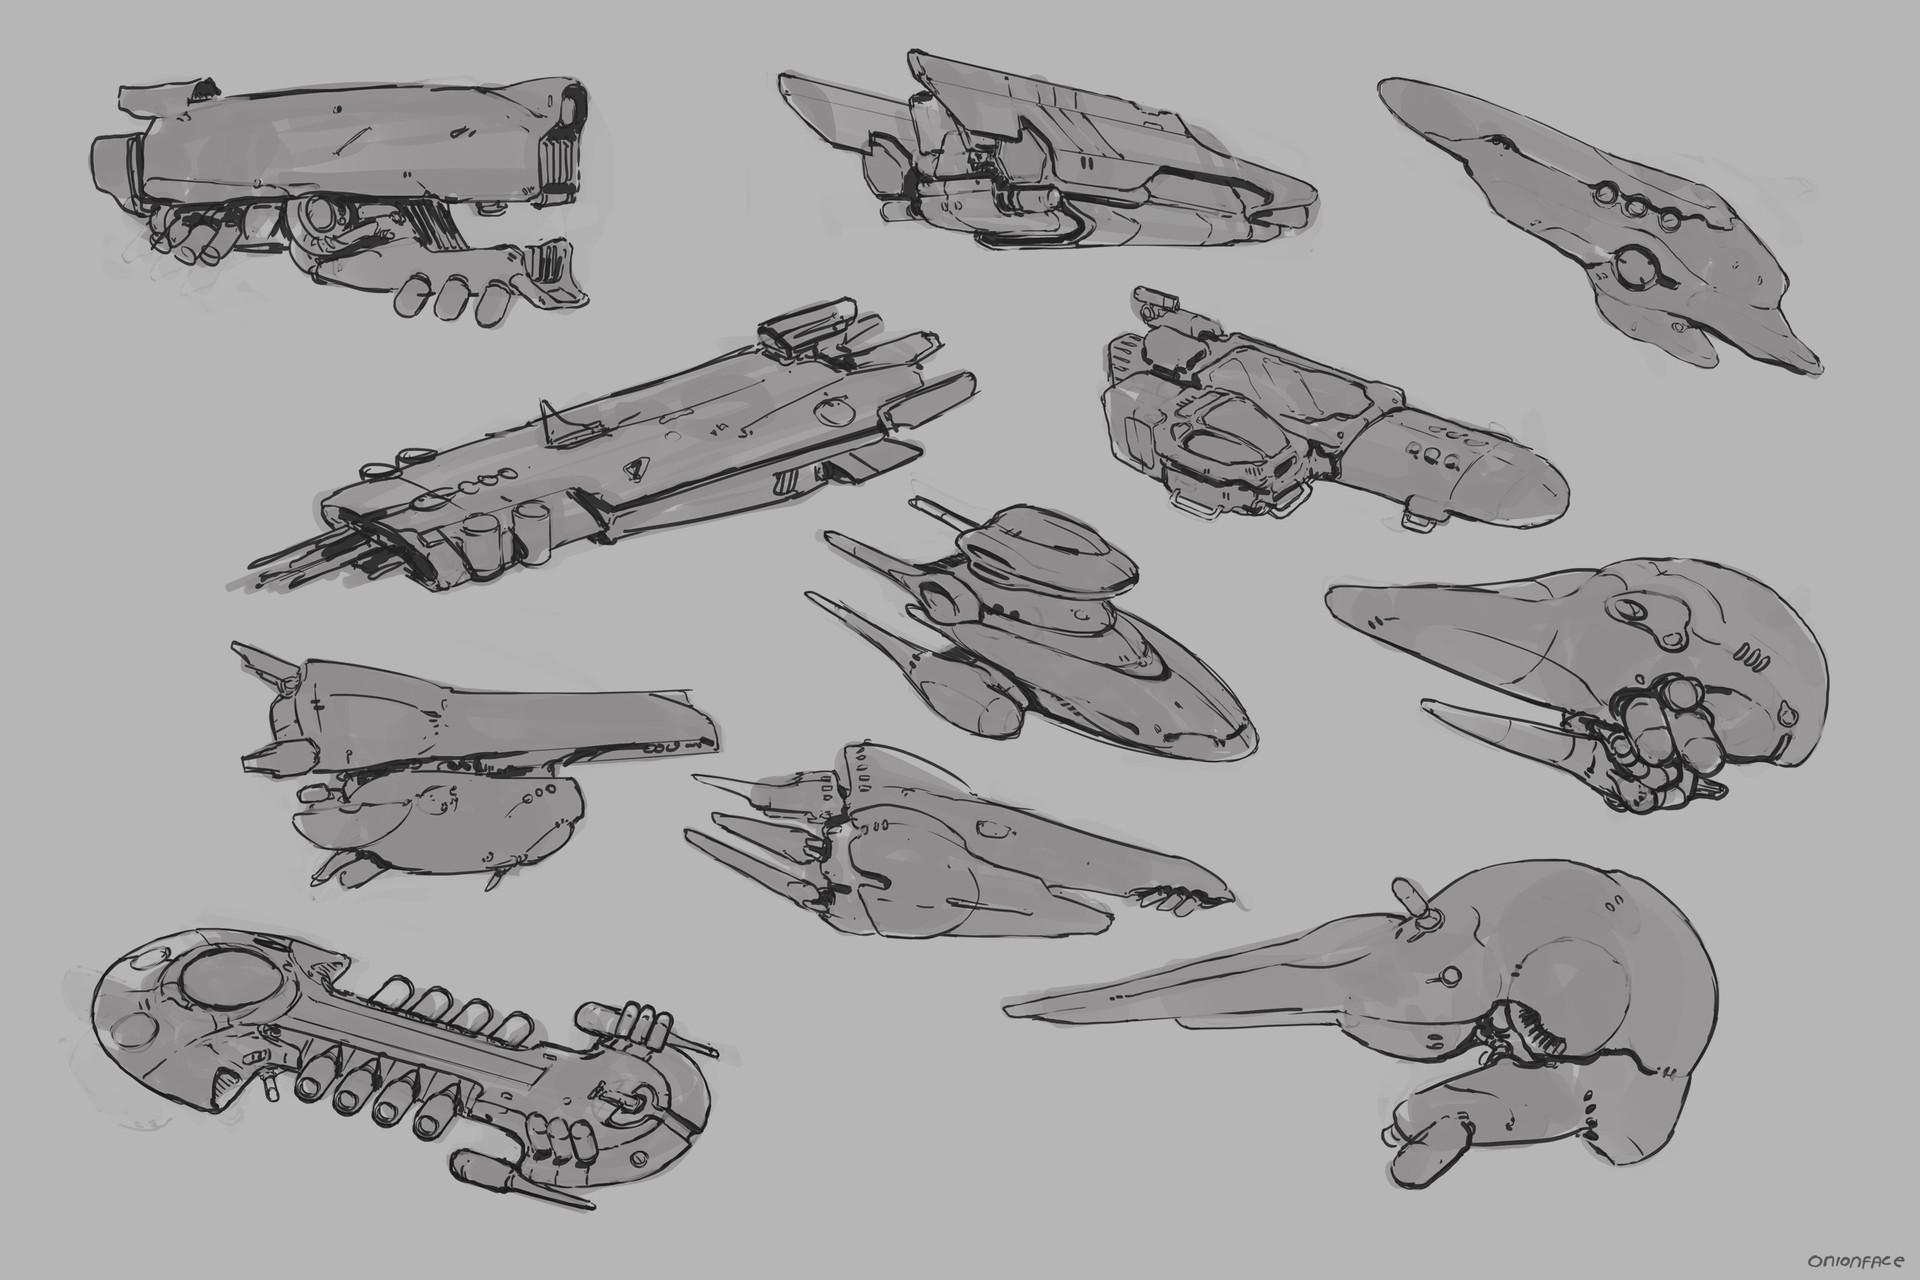 West clendinning spaceship doodles 01